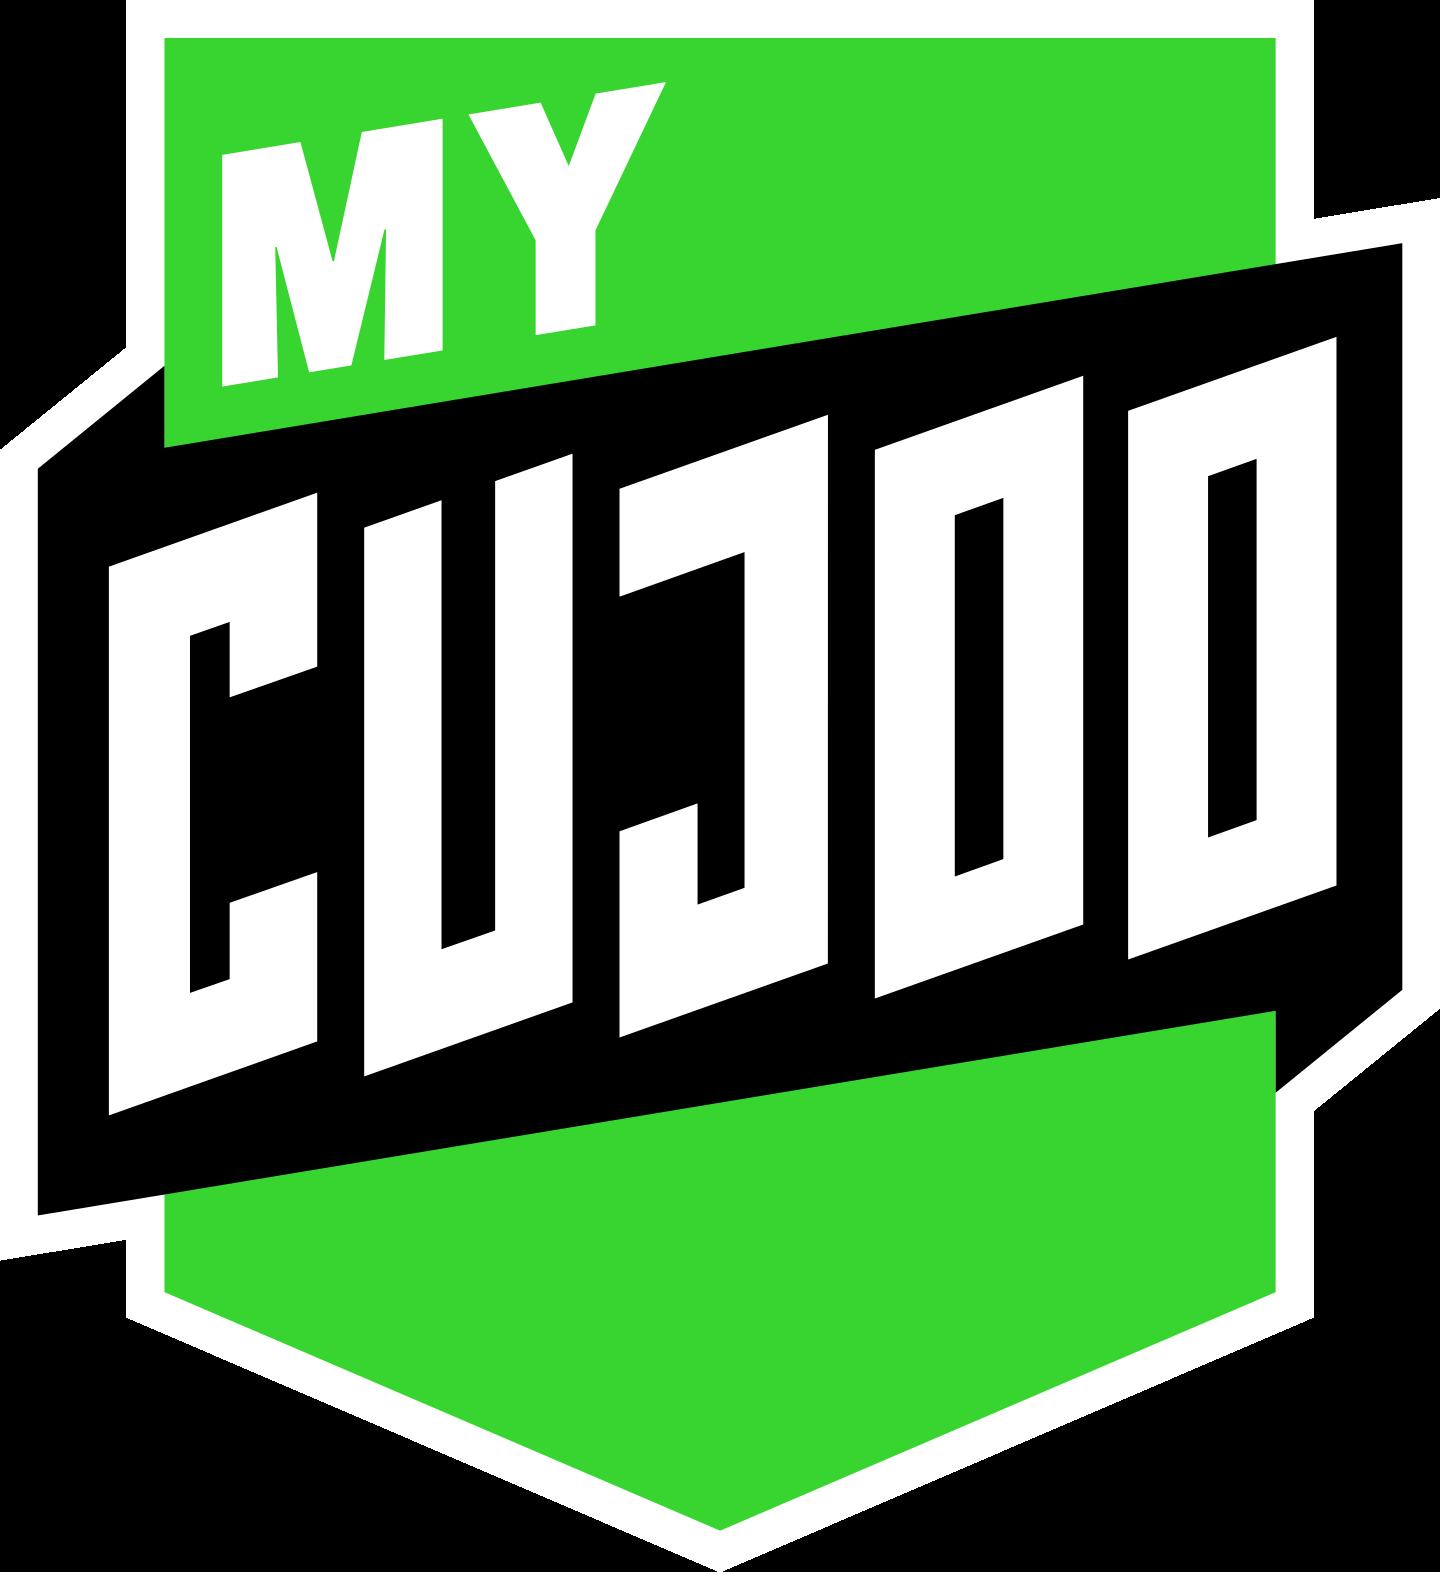 my cujoo logo 2 - My Cujoo Logo